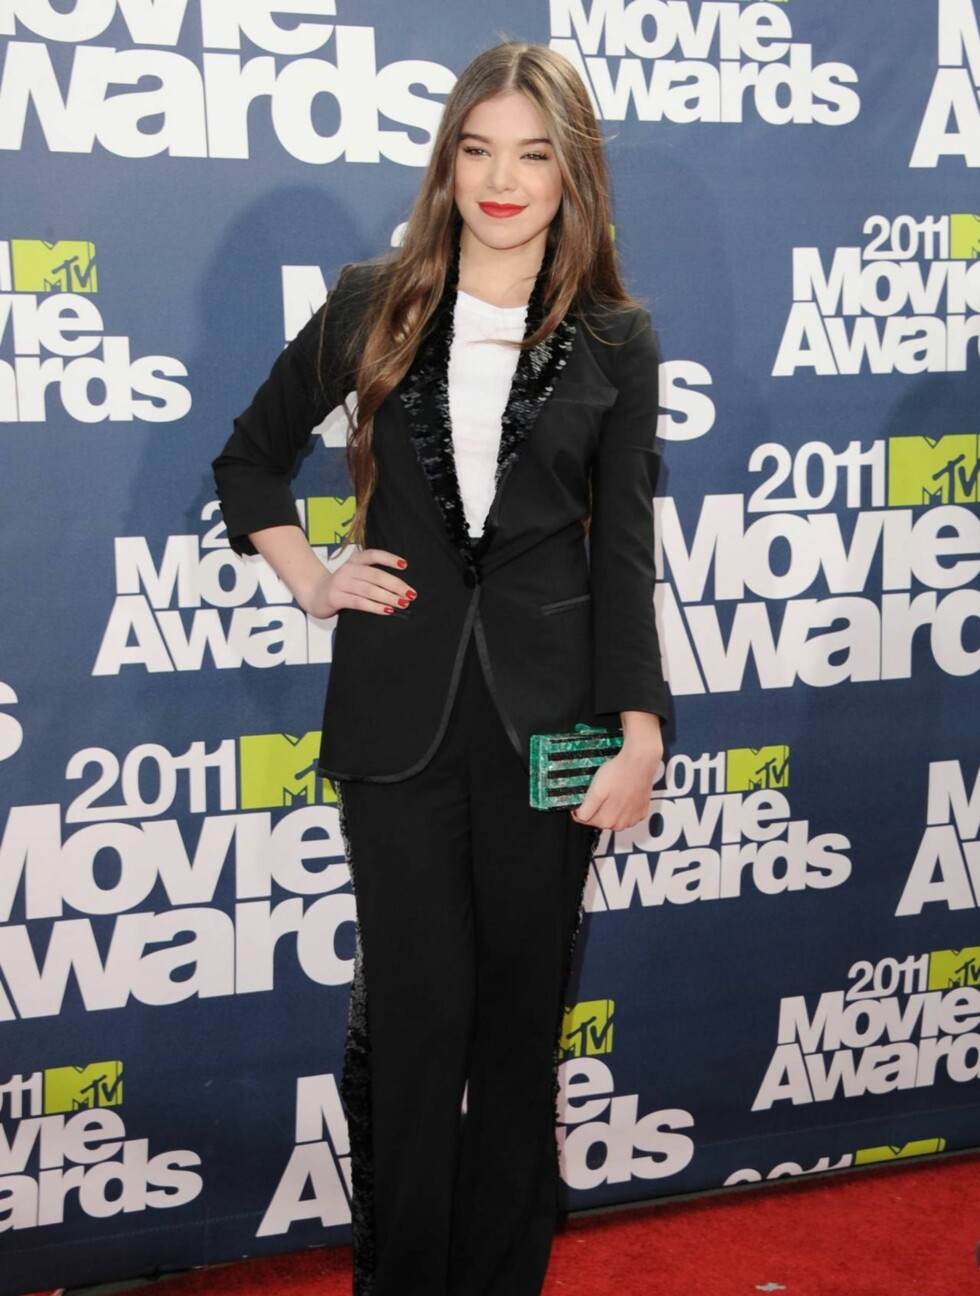 <strong>UNGT TALENT:</strong> 14 år gamle Hailee Steinfeld ble  tidligere i år Oscar-nominert for sin rolle i «True Grit». Nå står rolletilbudene i kø. Ungjenta kom i smoking fra Louis Vuitton og hadde veske fra Edie Parker. Foto: All Over Press